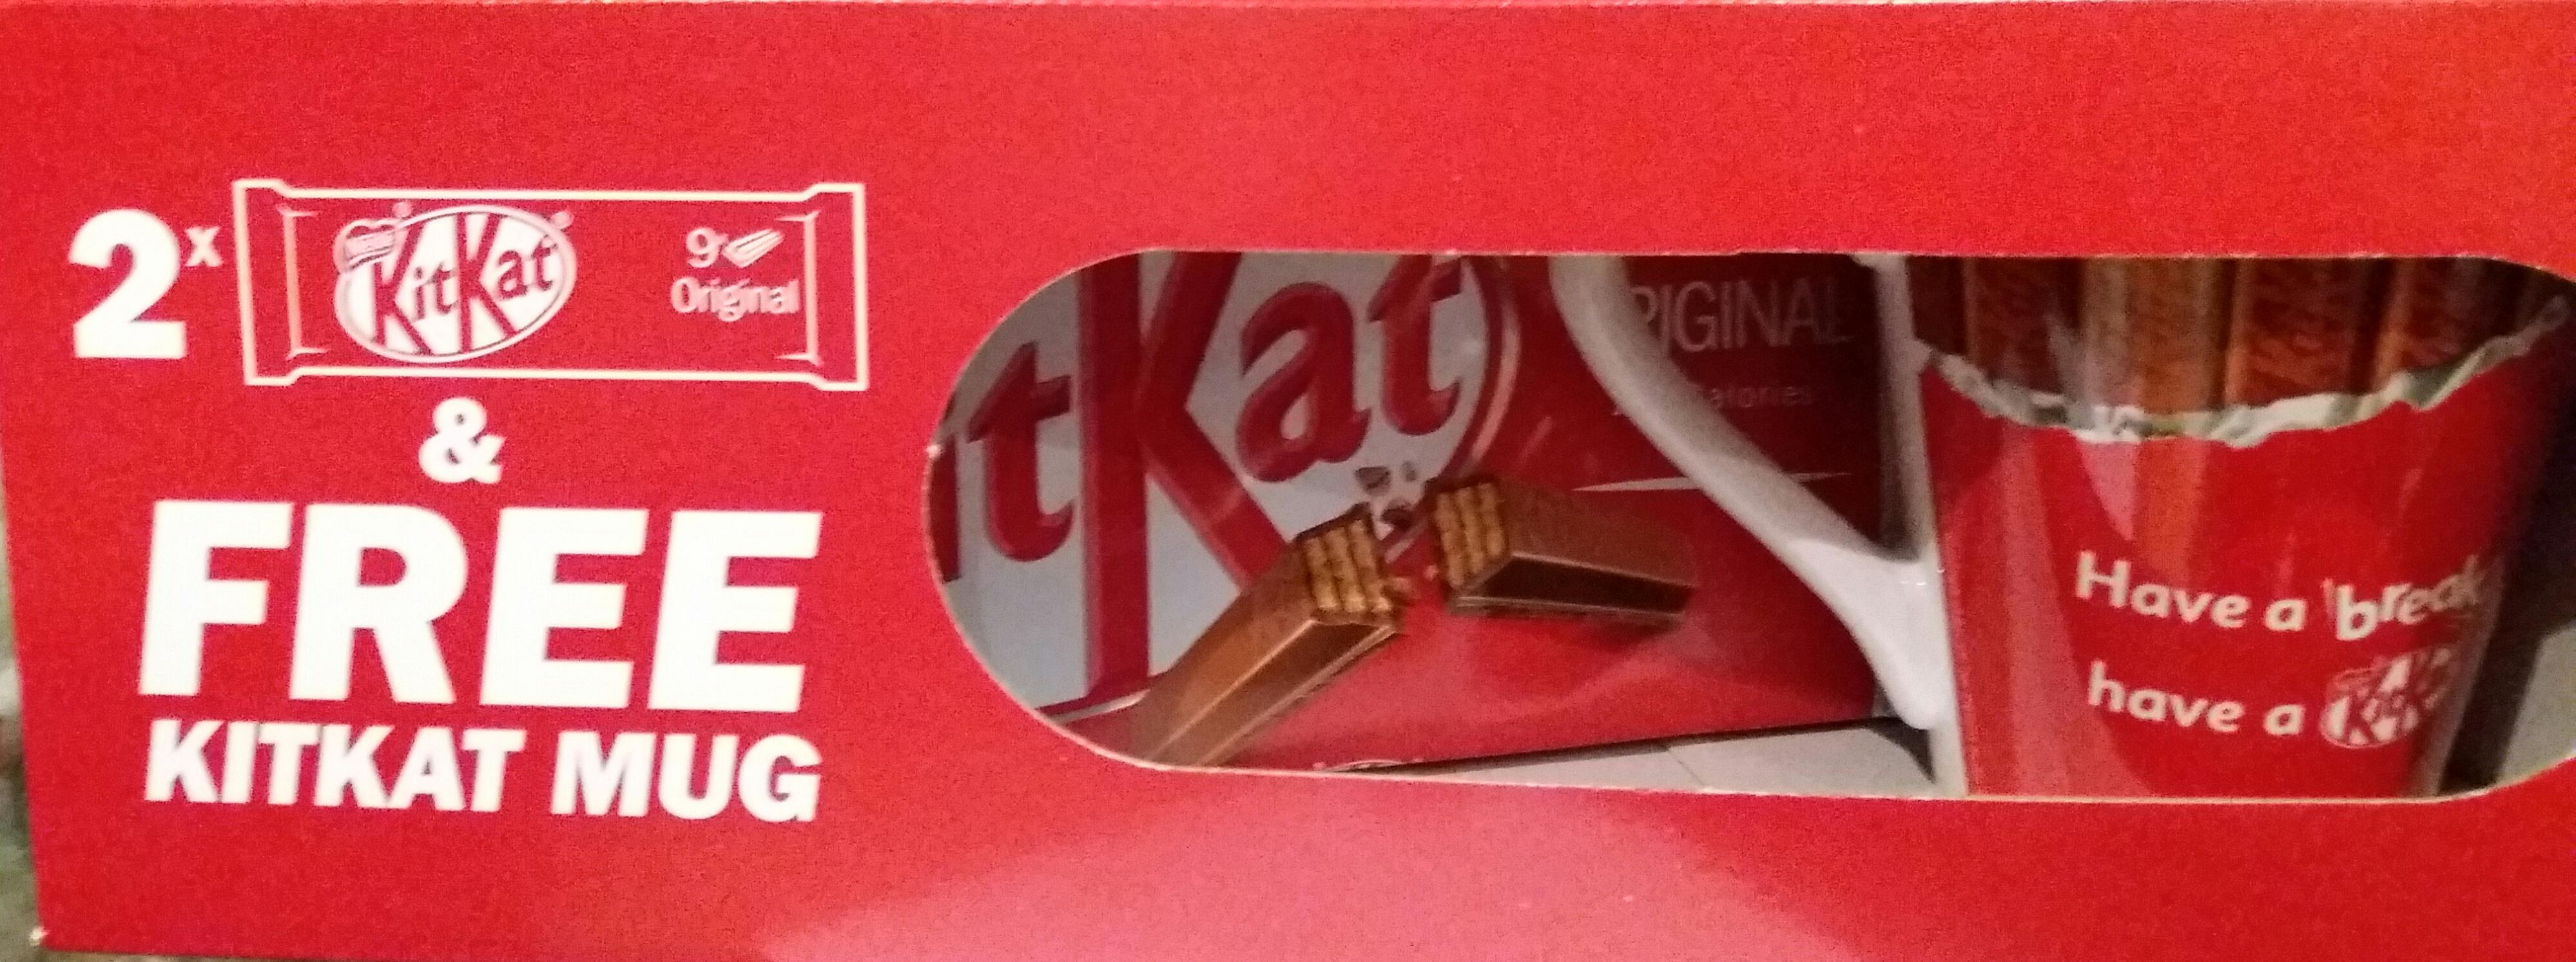 2 x 9 KitKats plus free mug Tesco (Addlestone) - 75p